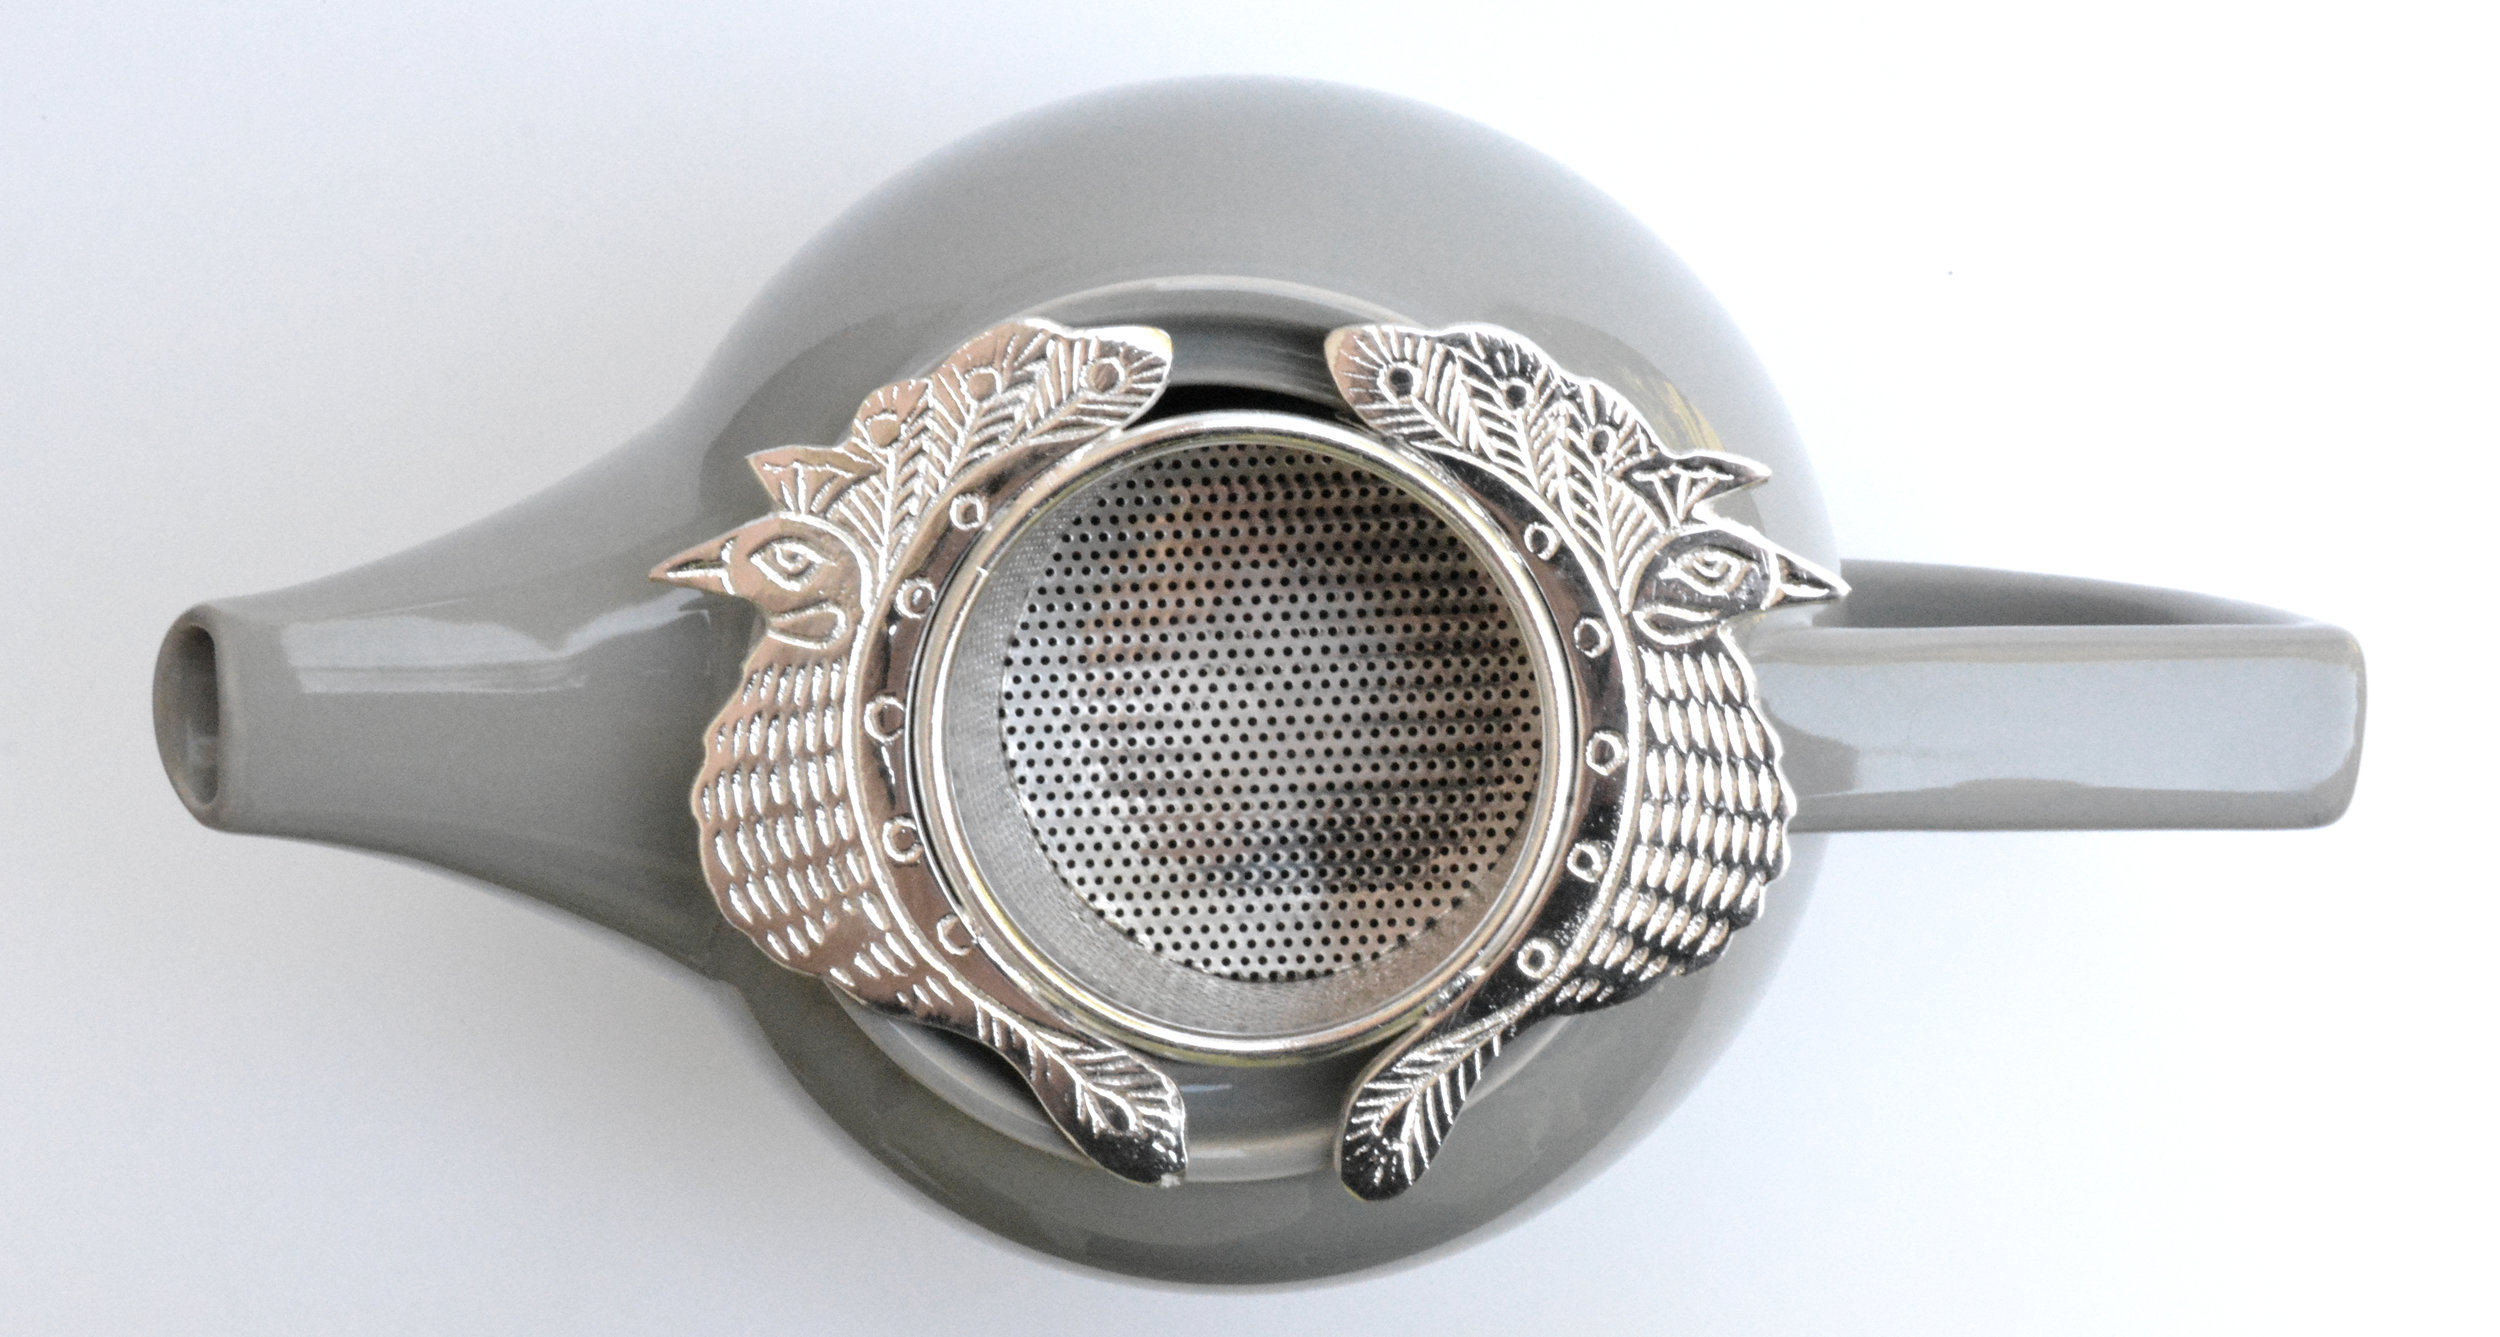 DSC_09elephant approved™ peacock tea infuser88.JPG